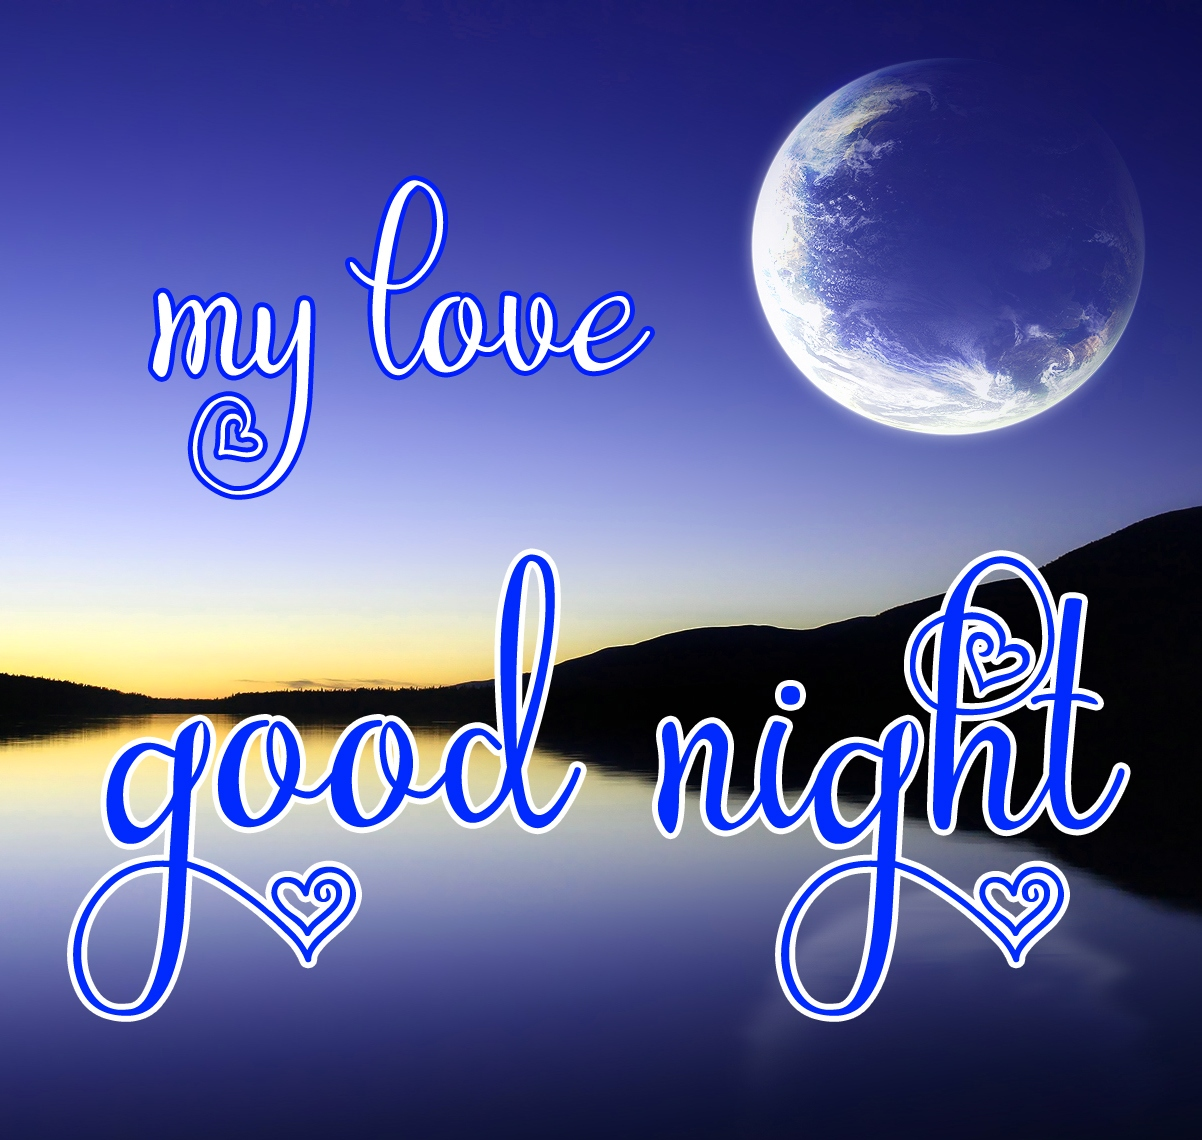 Free good night Images 91